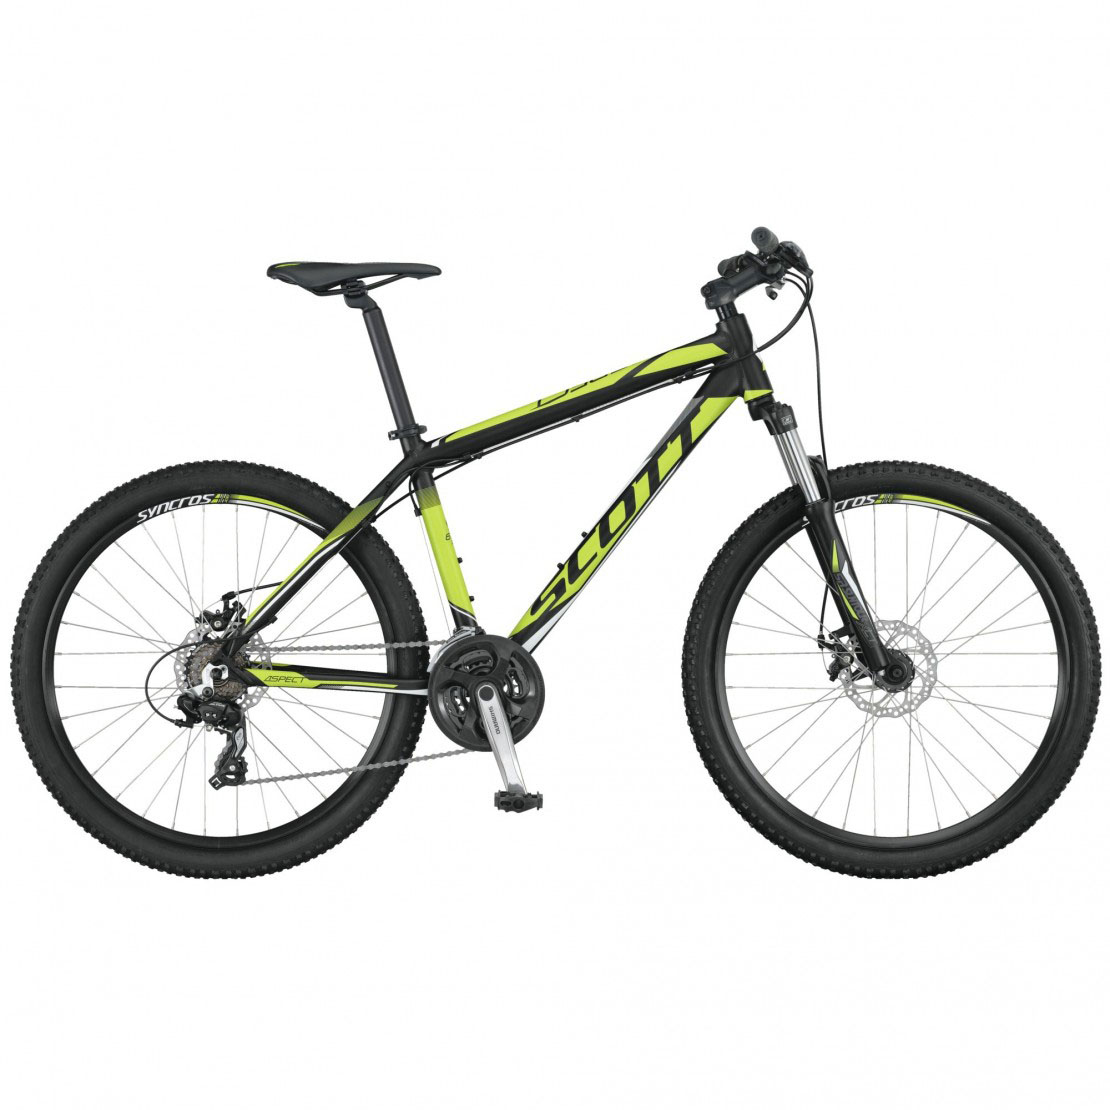 Scott Aspect 670 2014 Hardtail Mountain Bike%0A%09%09%09%09%09%09title=